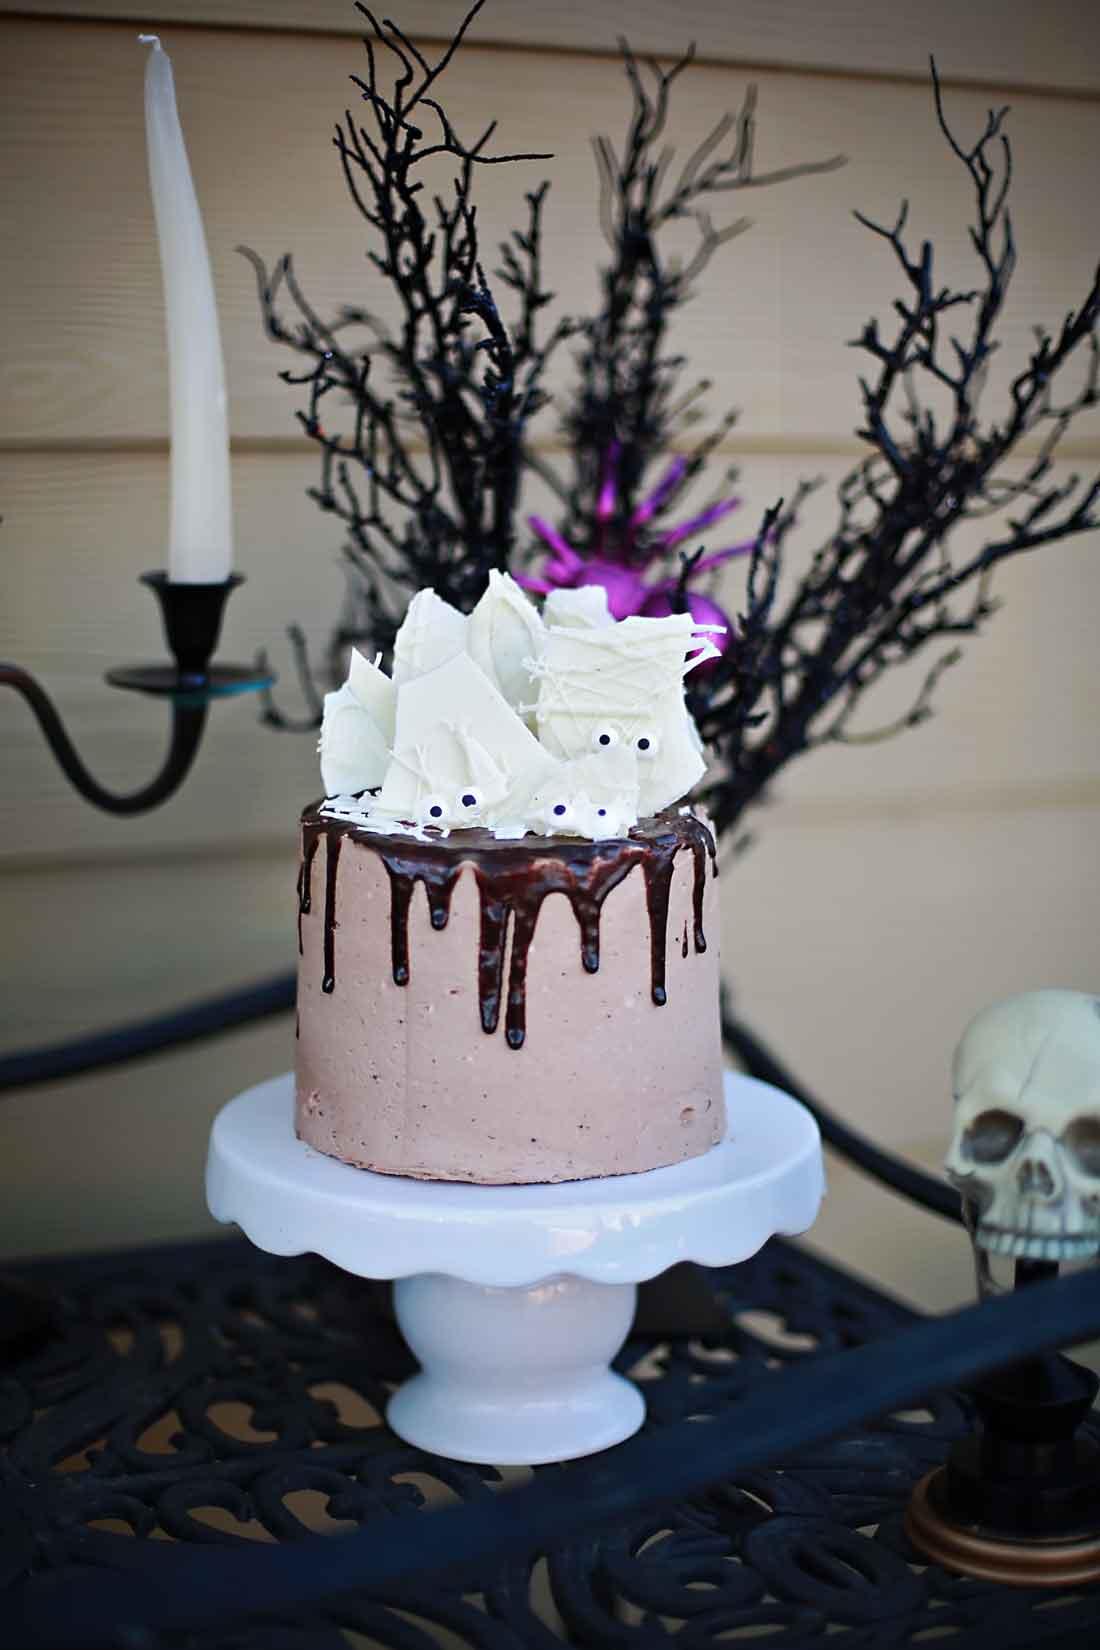 Scream Cheese Chocolate Cake tutuorial with video!